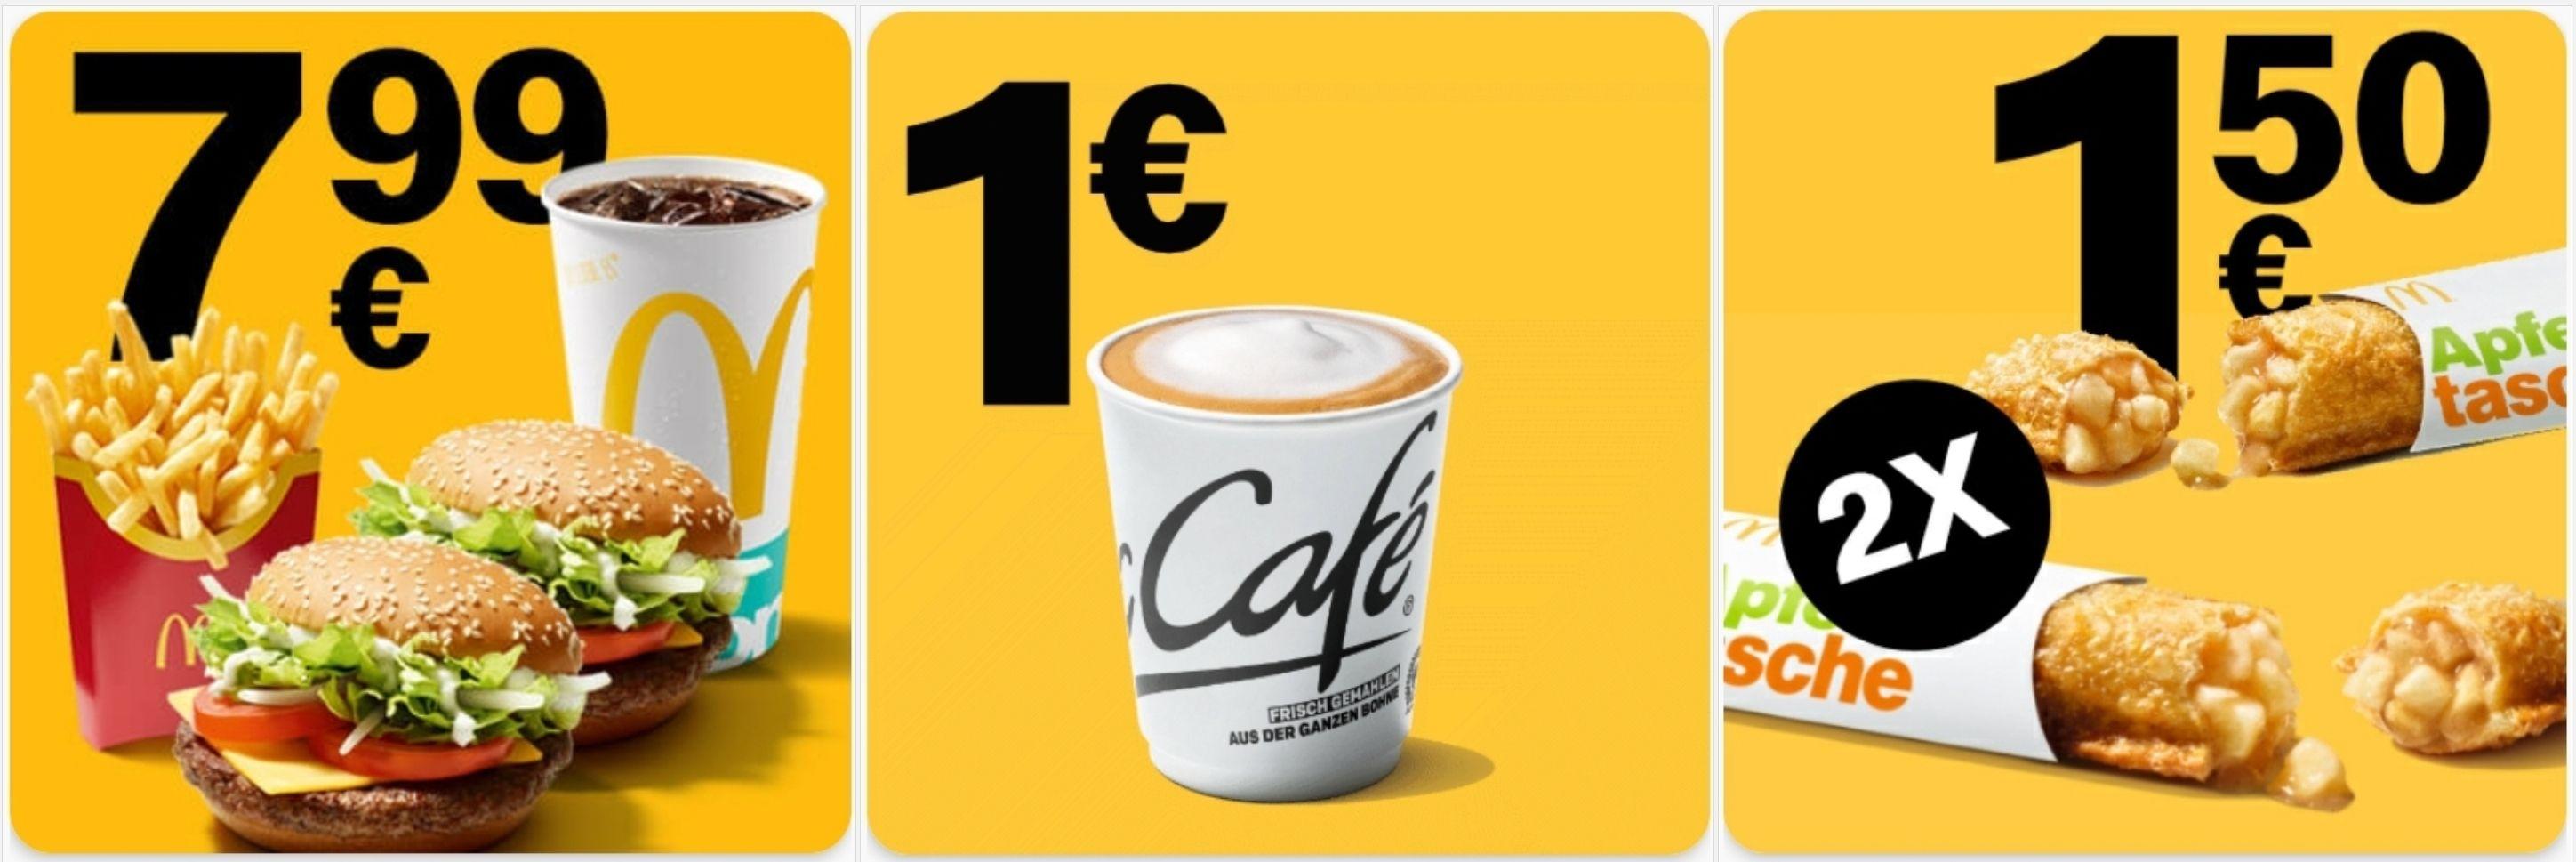 Doppelpack Menü für 7,99€, 2x Apfeltasche 1,50€ o. Cappuccino Small für 1€ [McDonald's App]